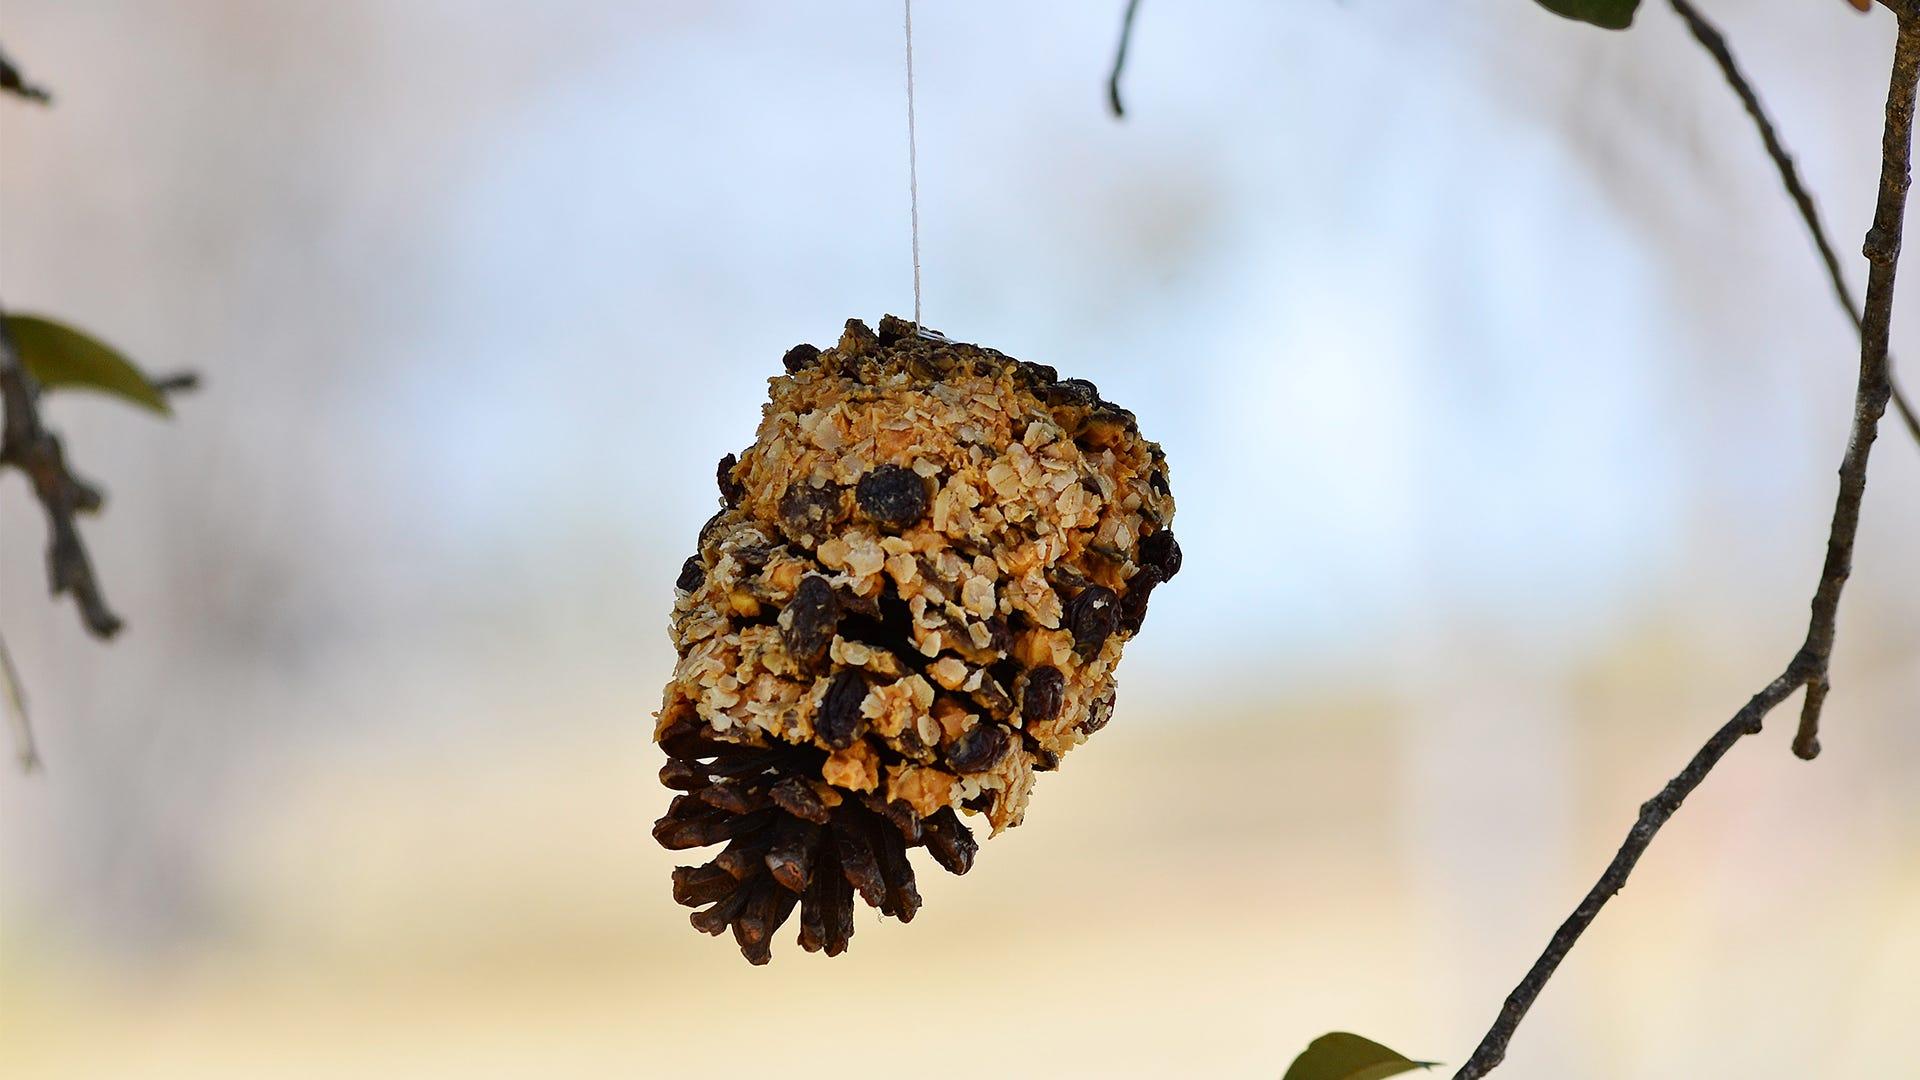 Get Crafty: 4 Easy Bird Feeding Crafts for the Family